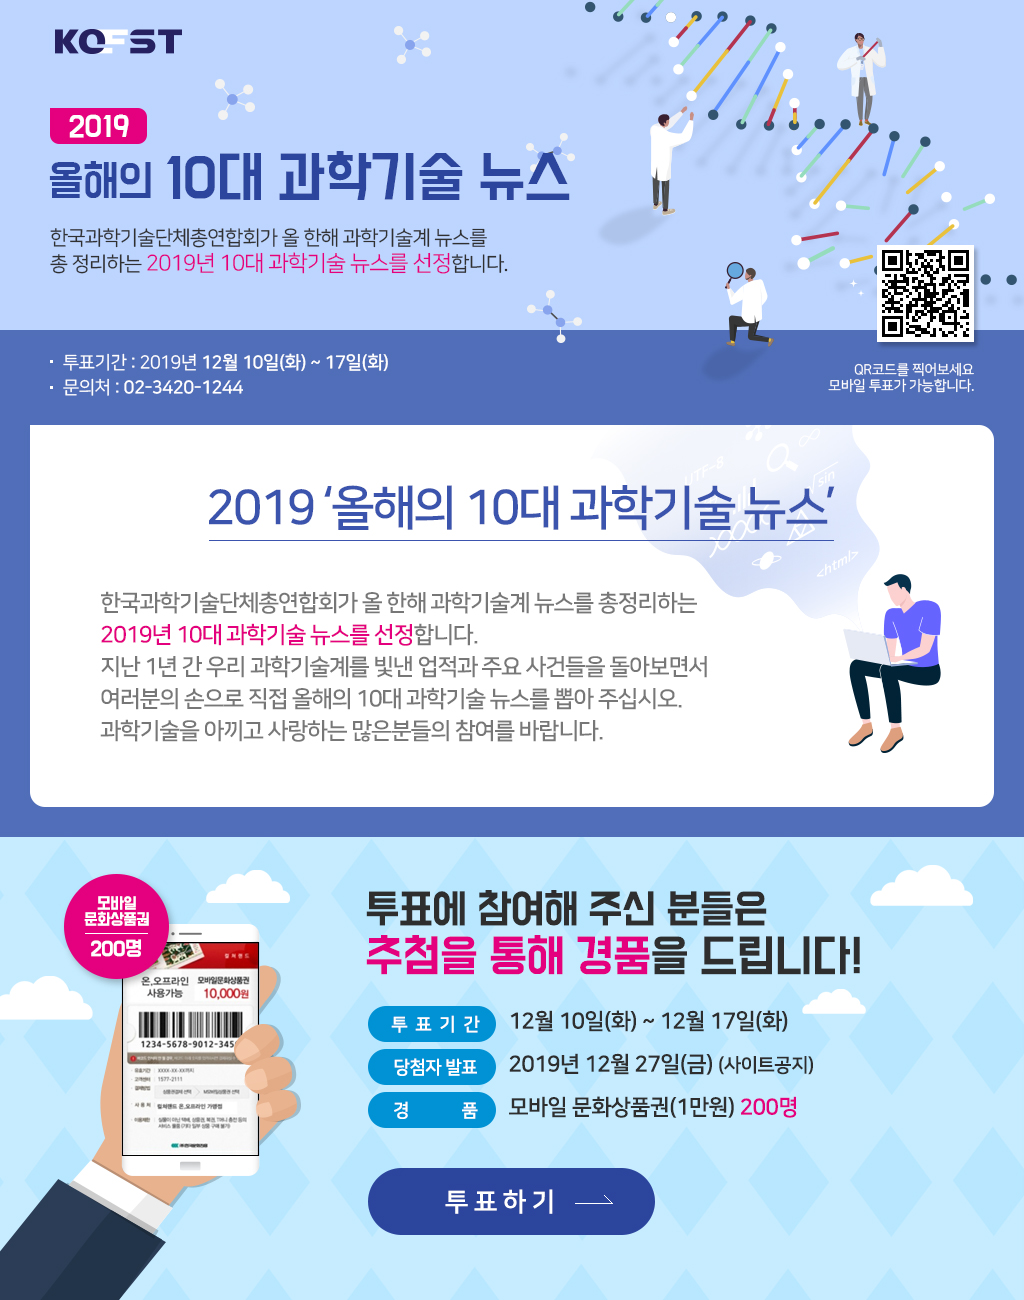 mailform_2019.jpg